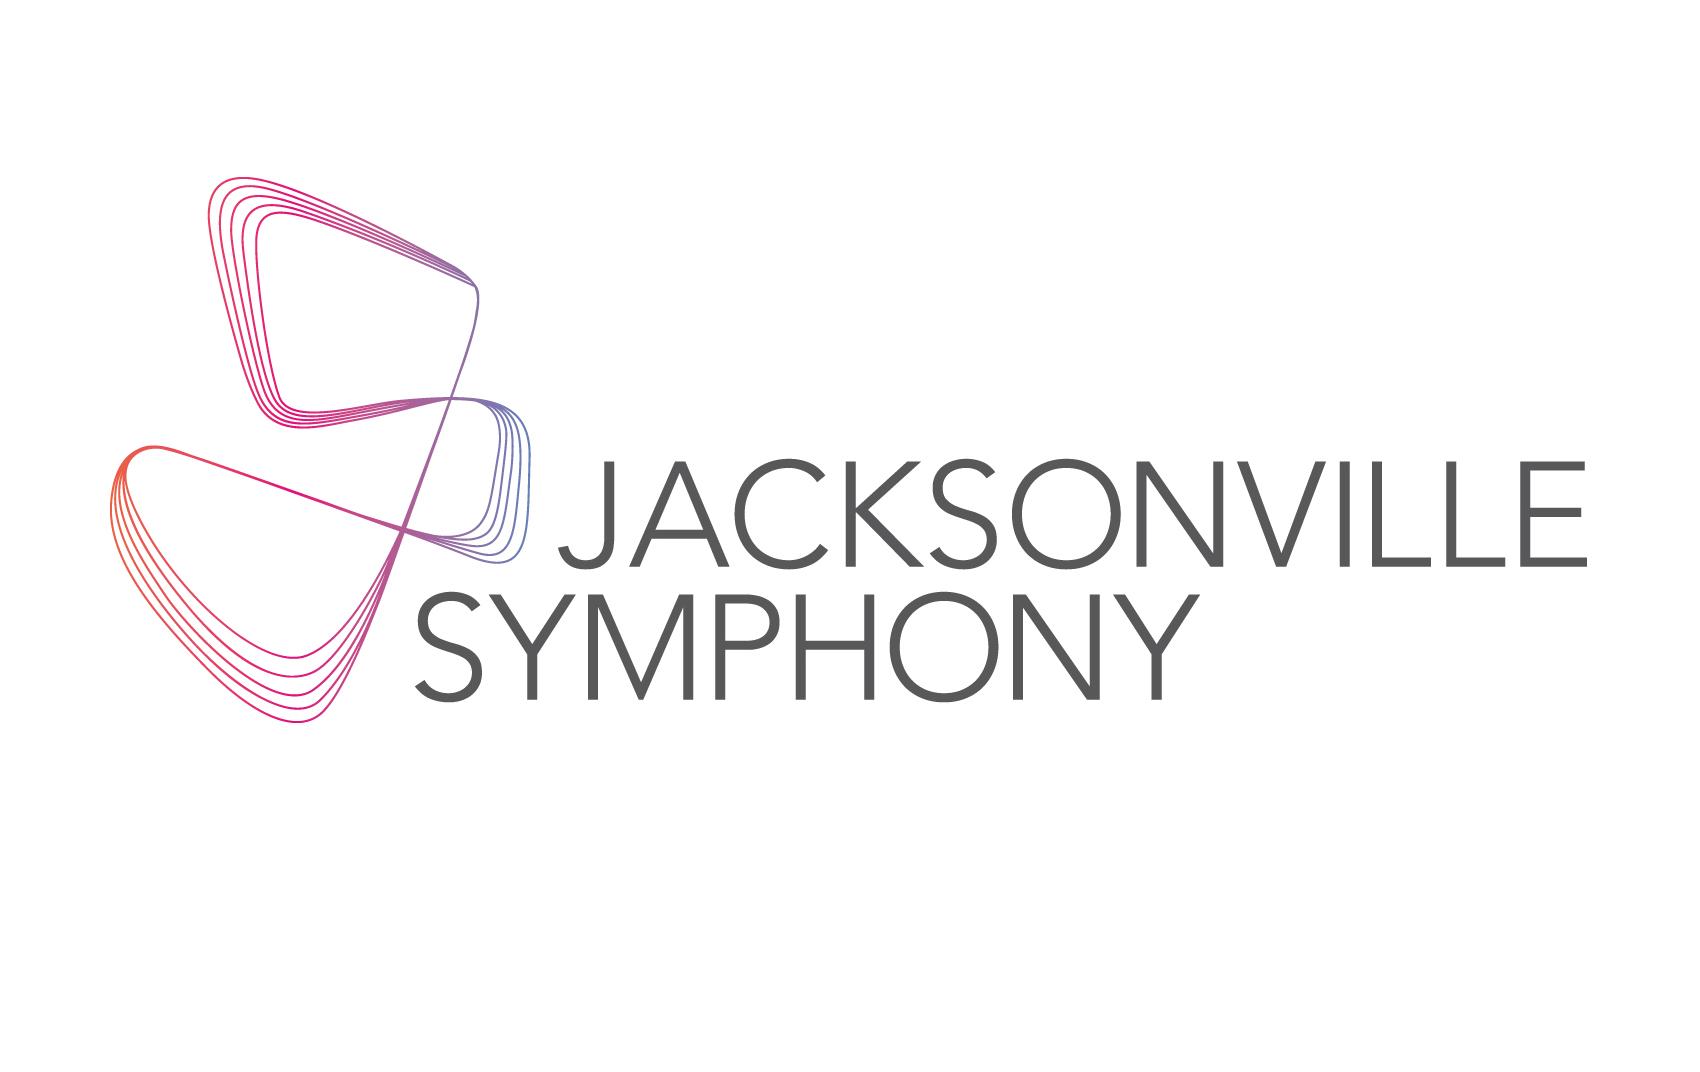 jax_sym_logo.jpg